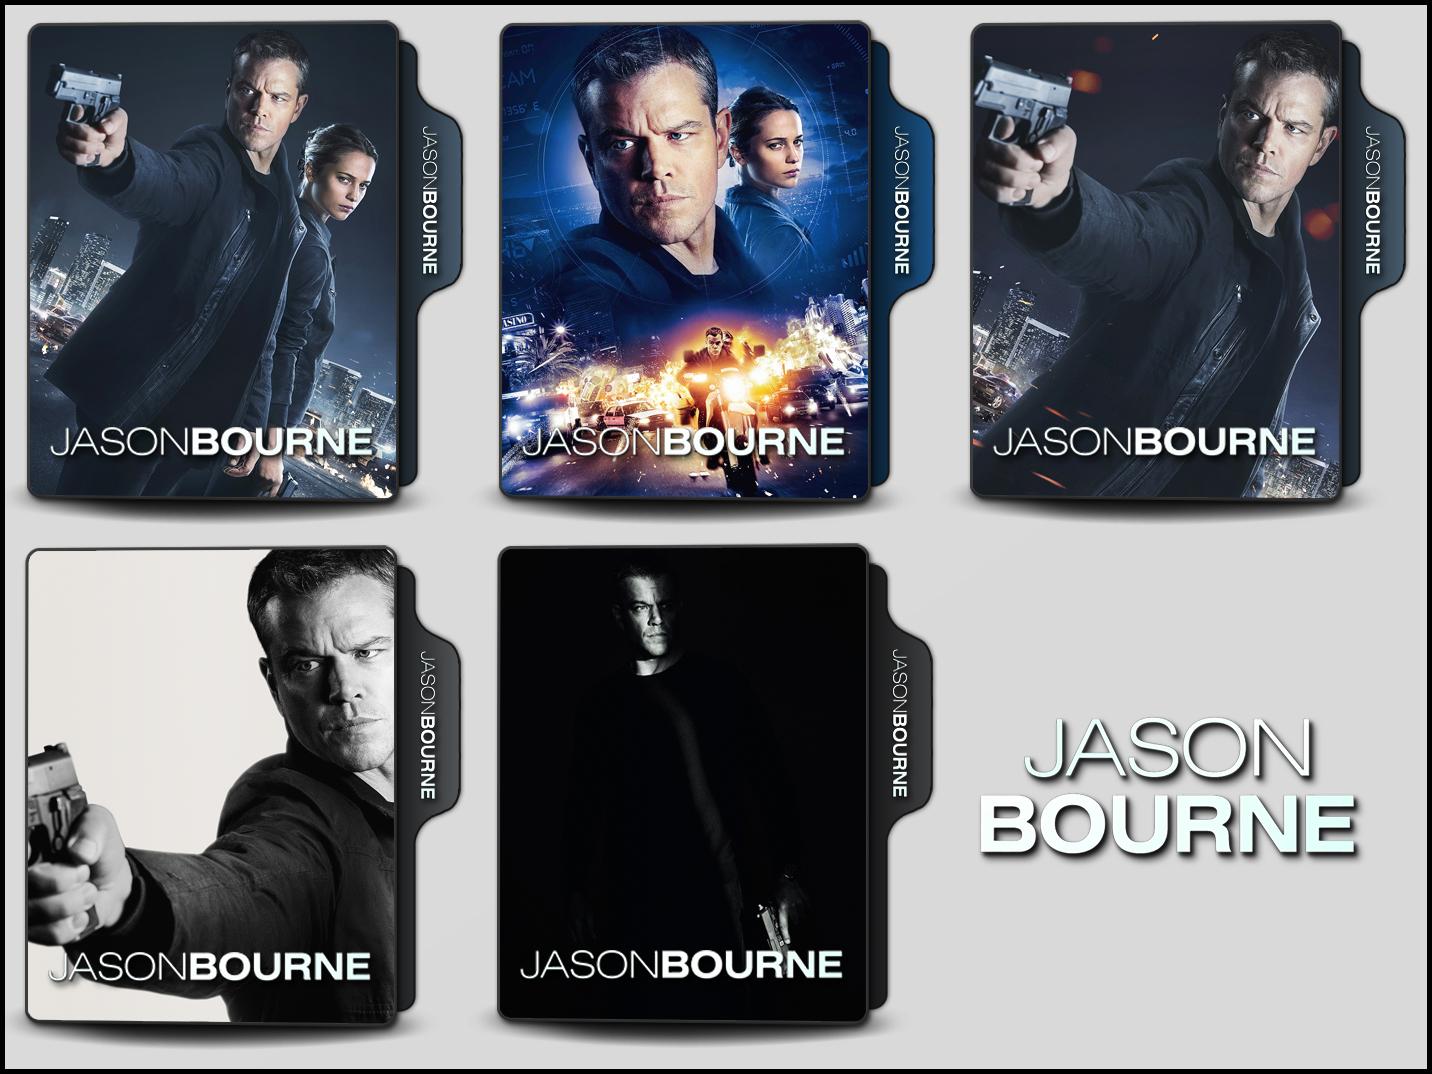 Jason Bourne 2016 Folder Icons By Onlystylematters On Deviantart